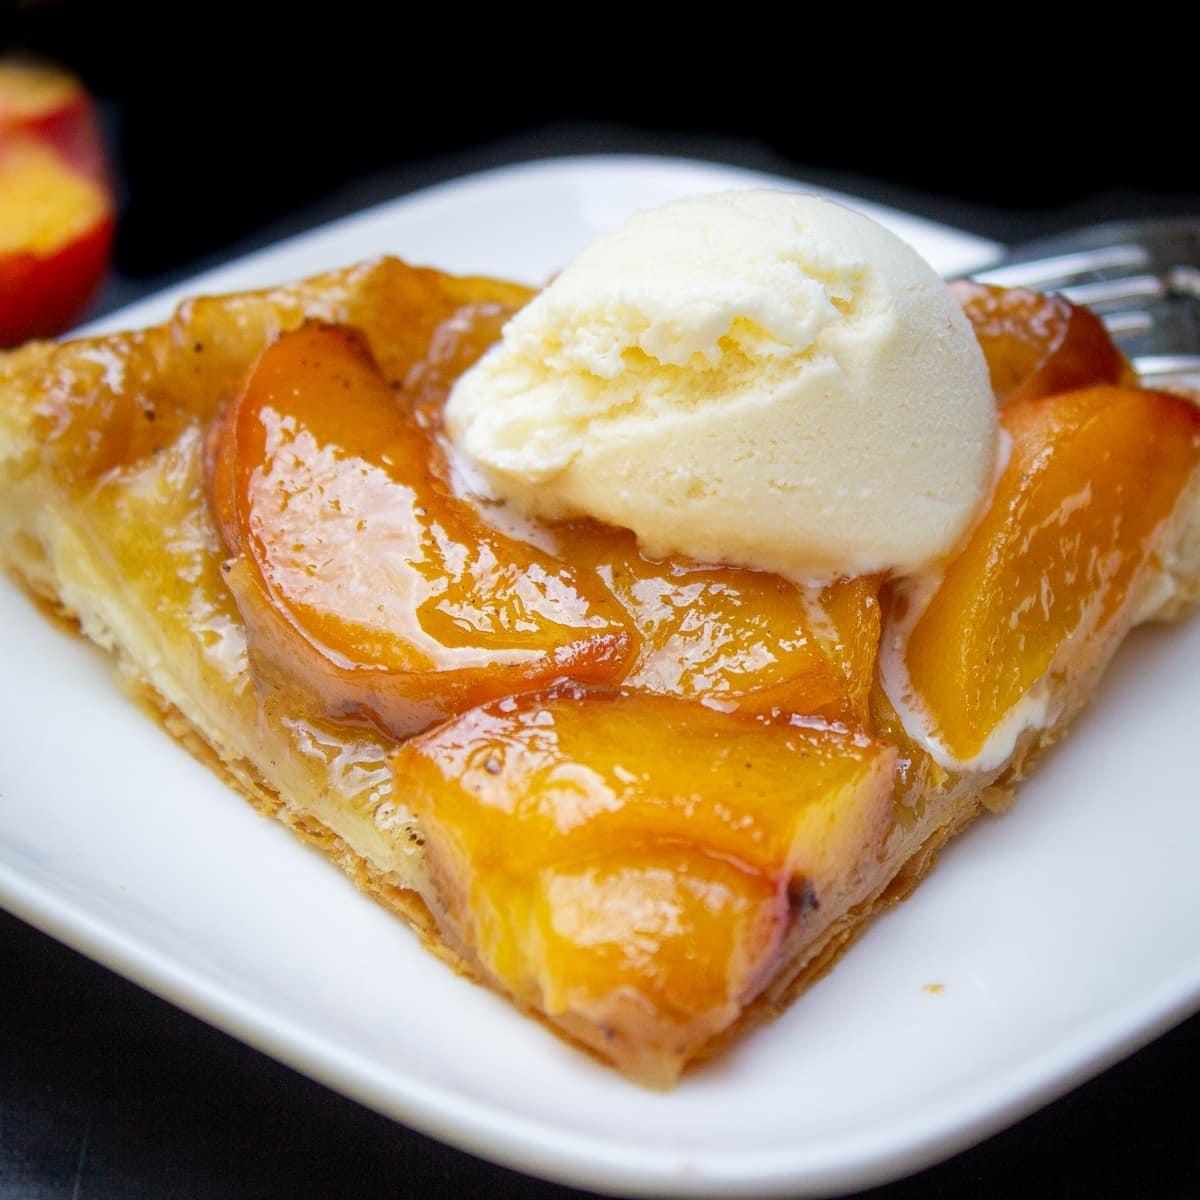 piece of peach tarte with ice cream on plate